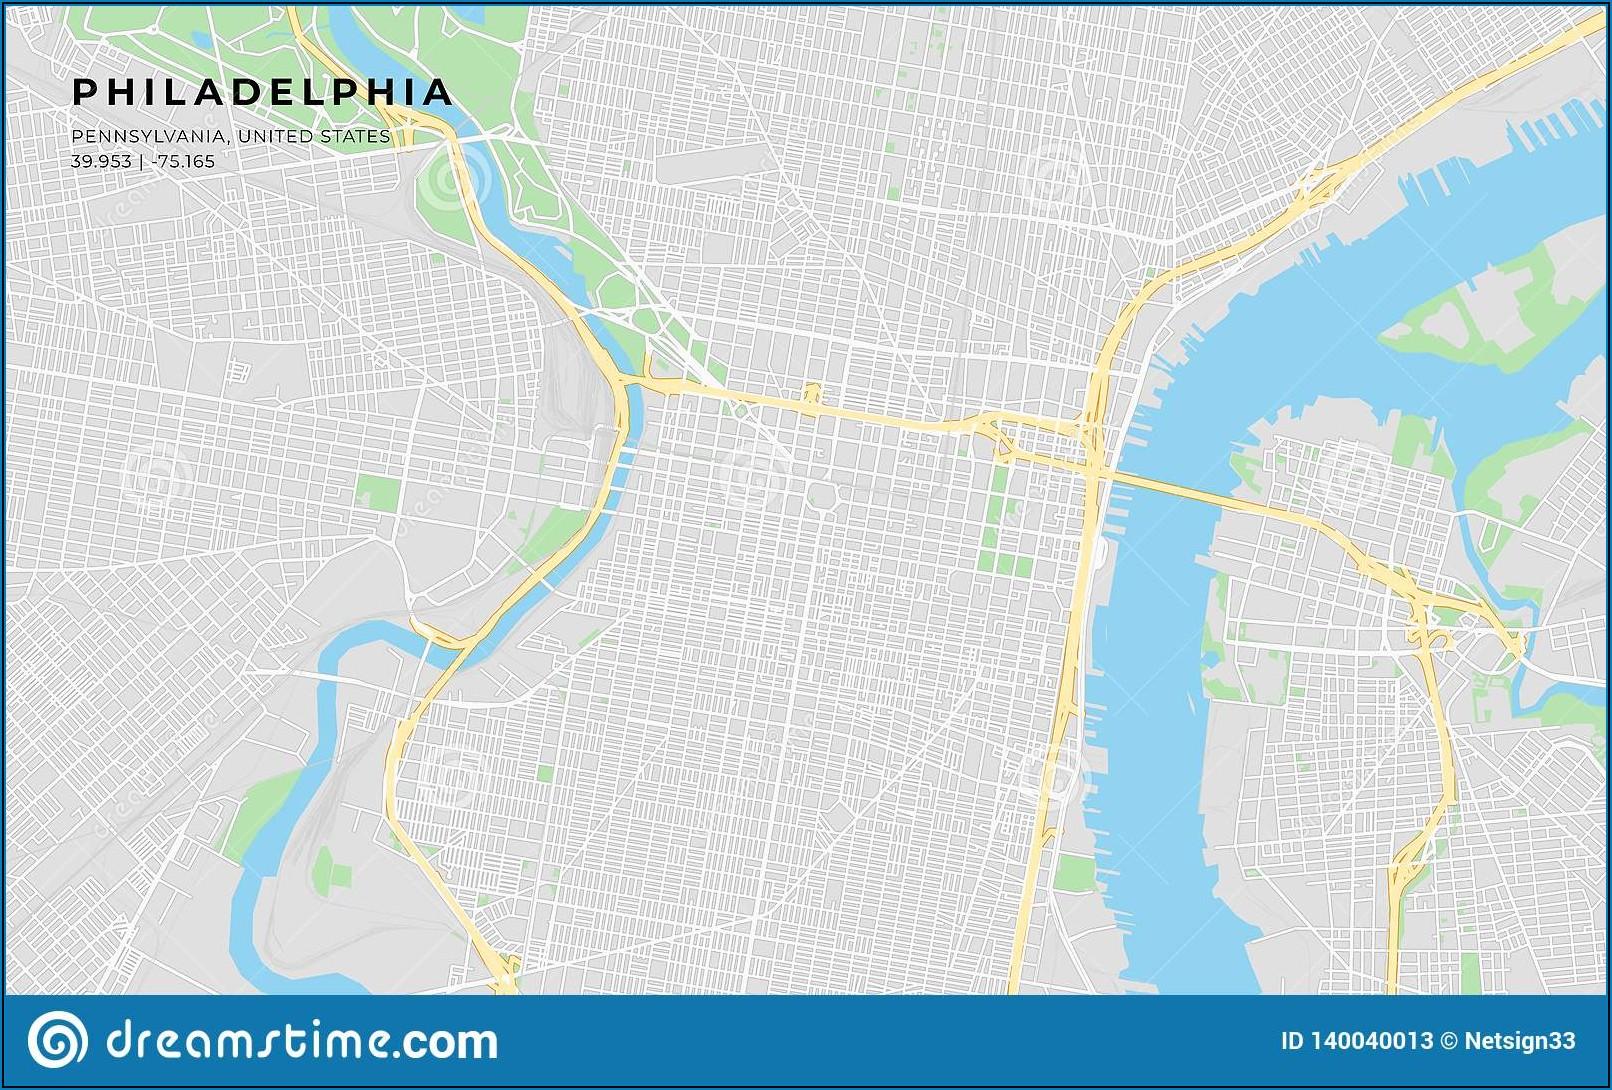 Printable Street Map Of Philadelphia